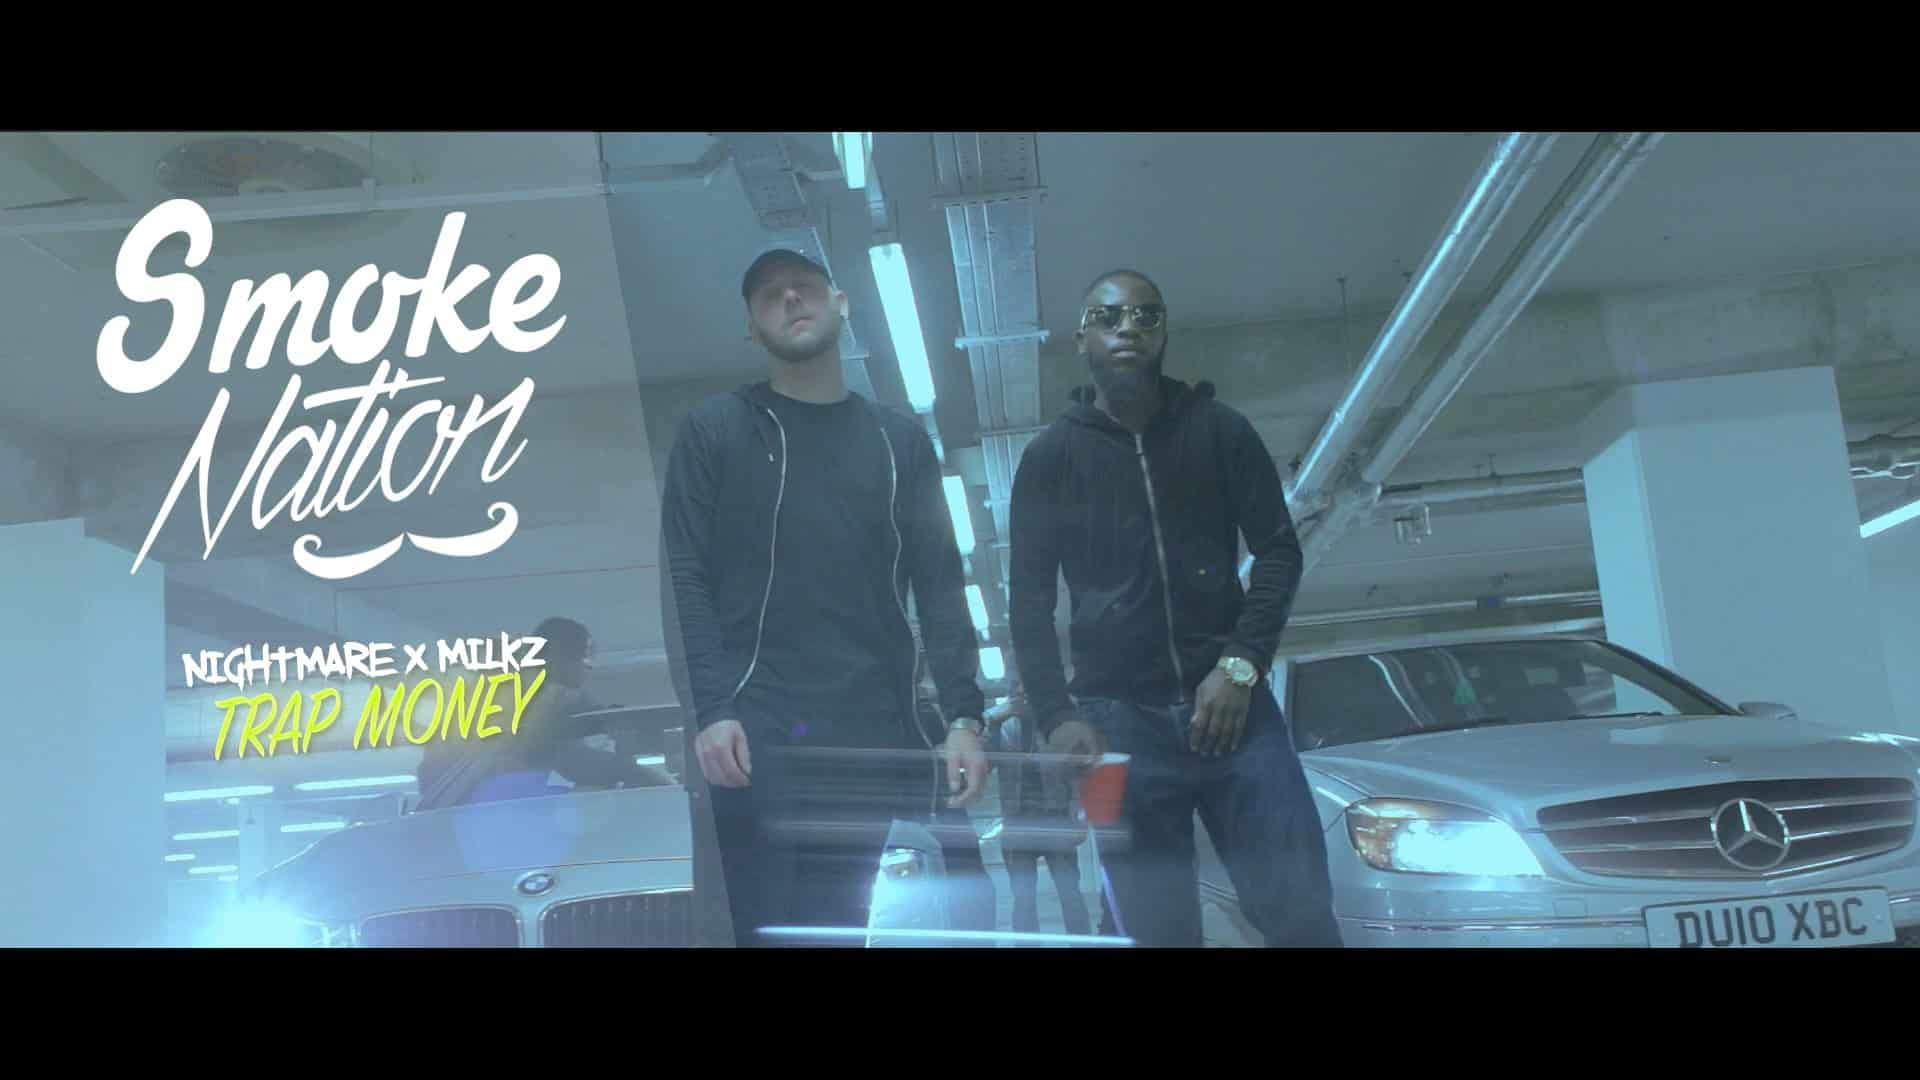 Nightmare x Milkz – Trap Money [Music Video]